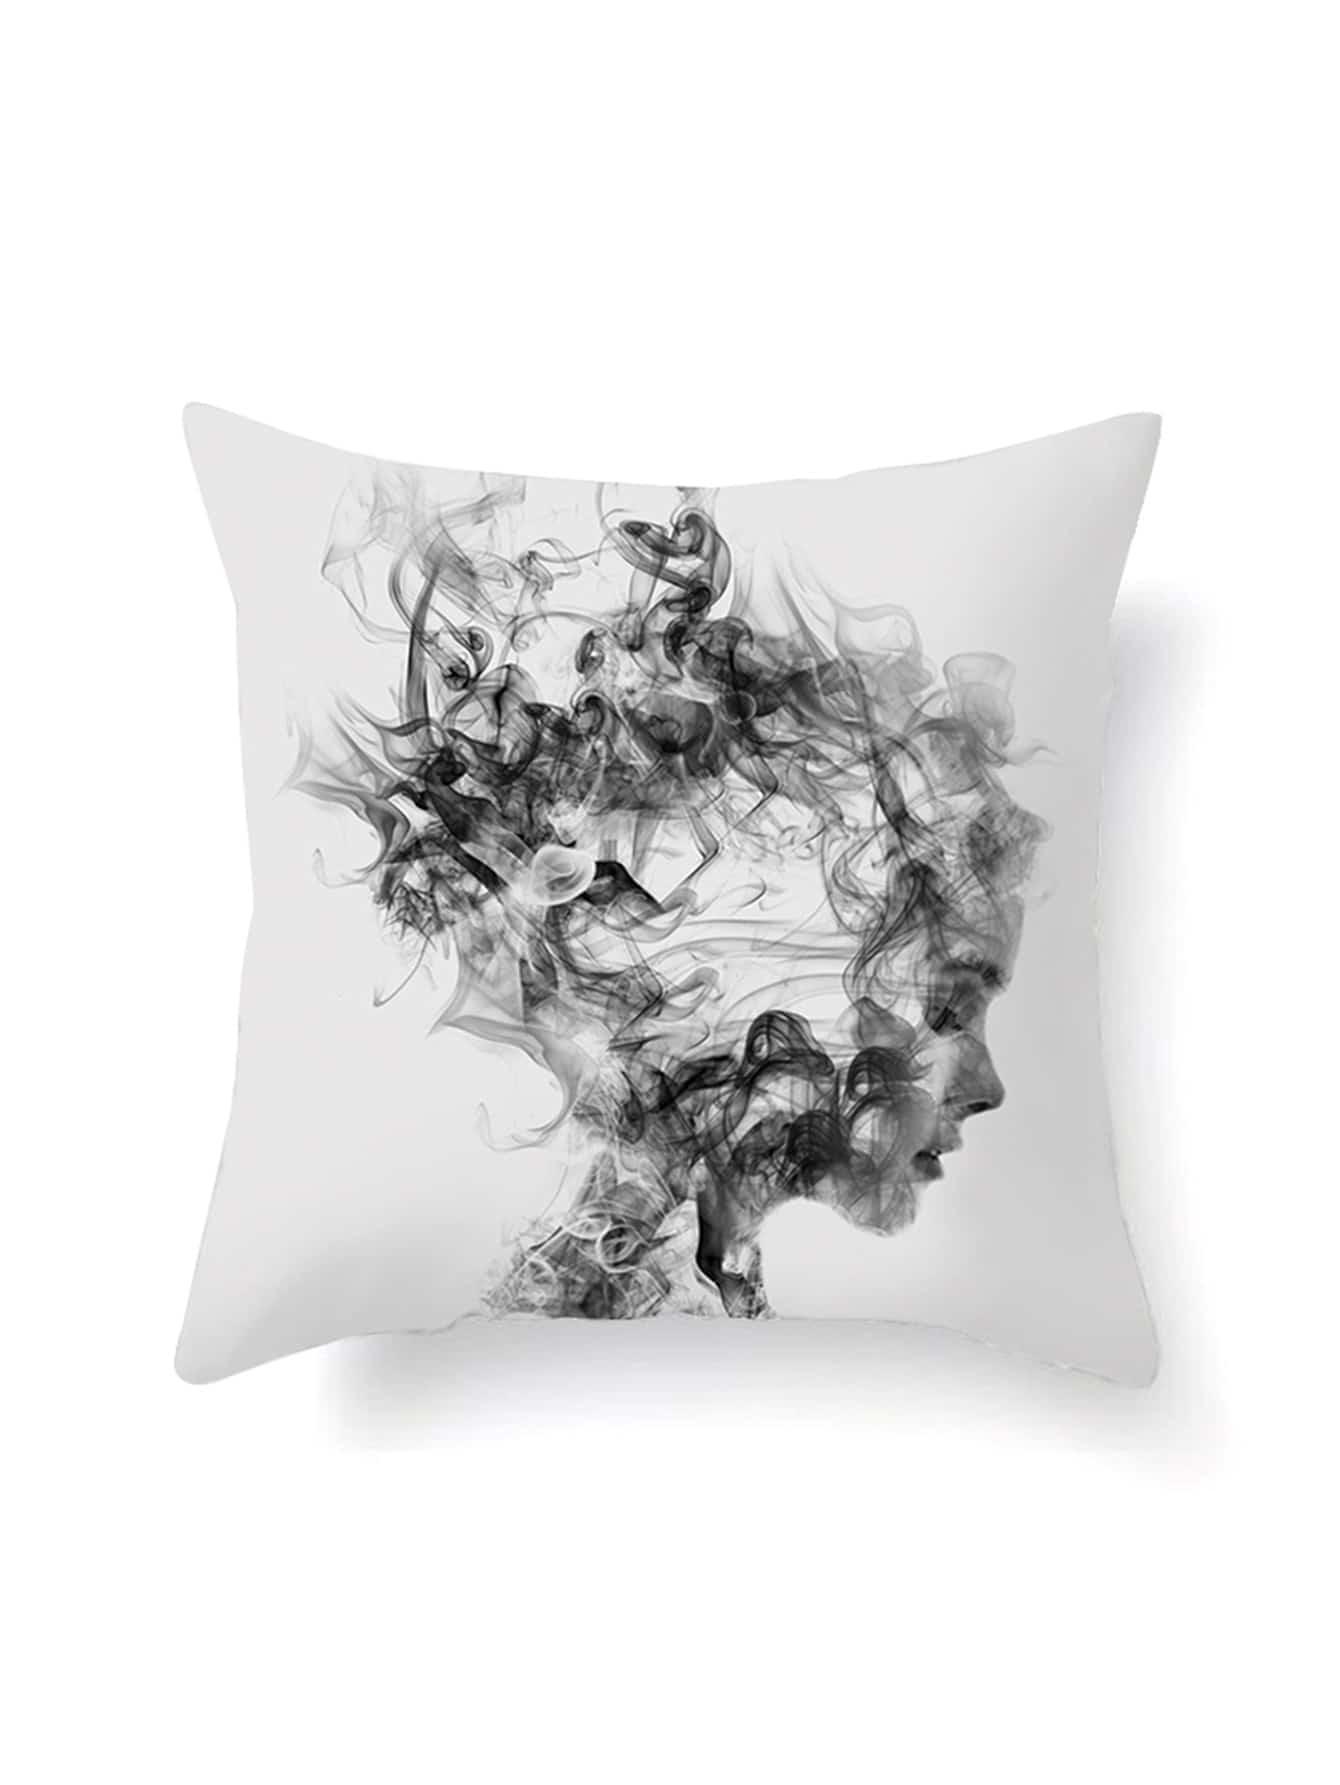 Abstract Girl Print Pillowcase Cover